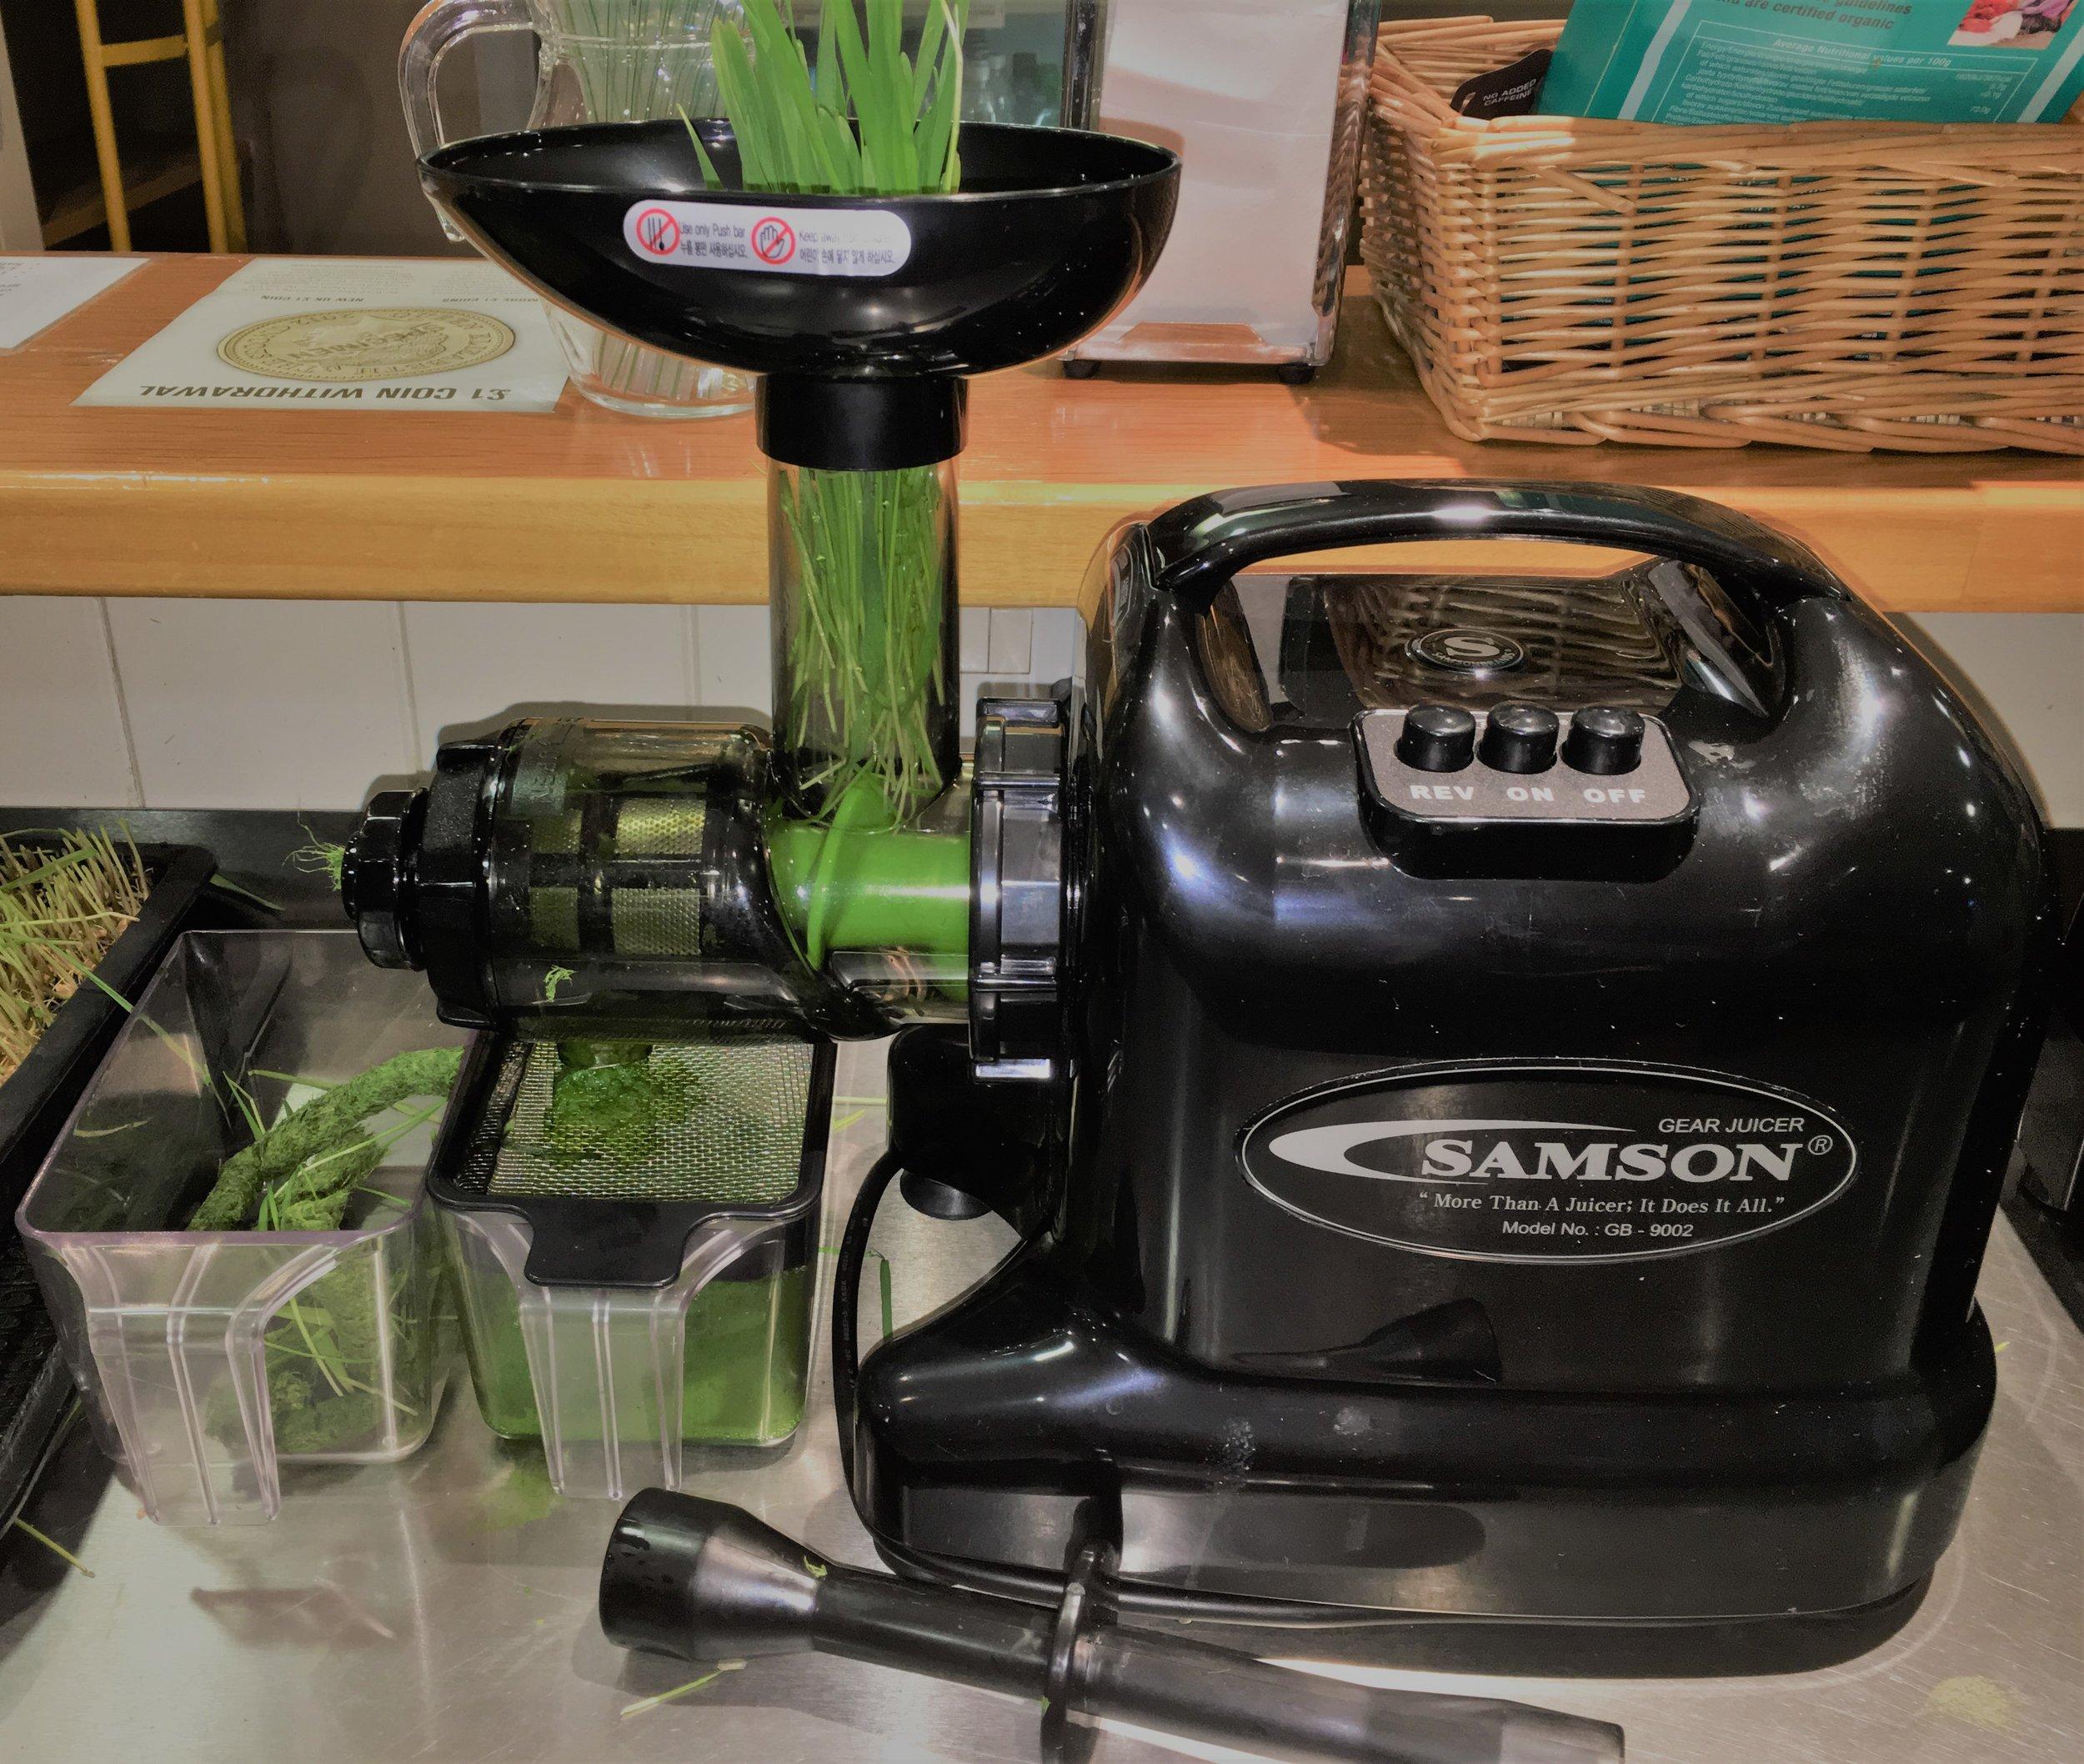 Samson Wheatgrass Juicer